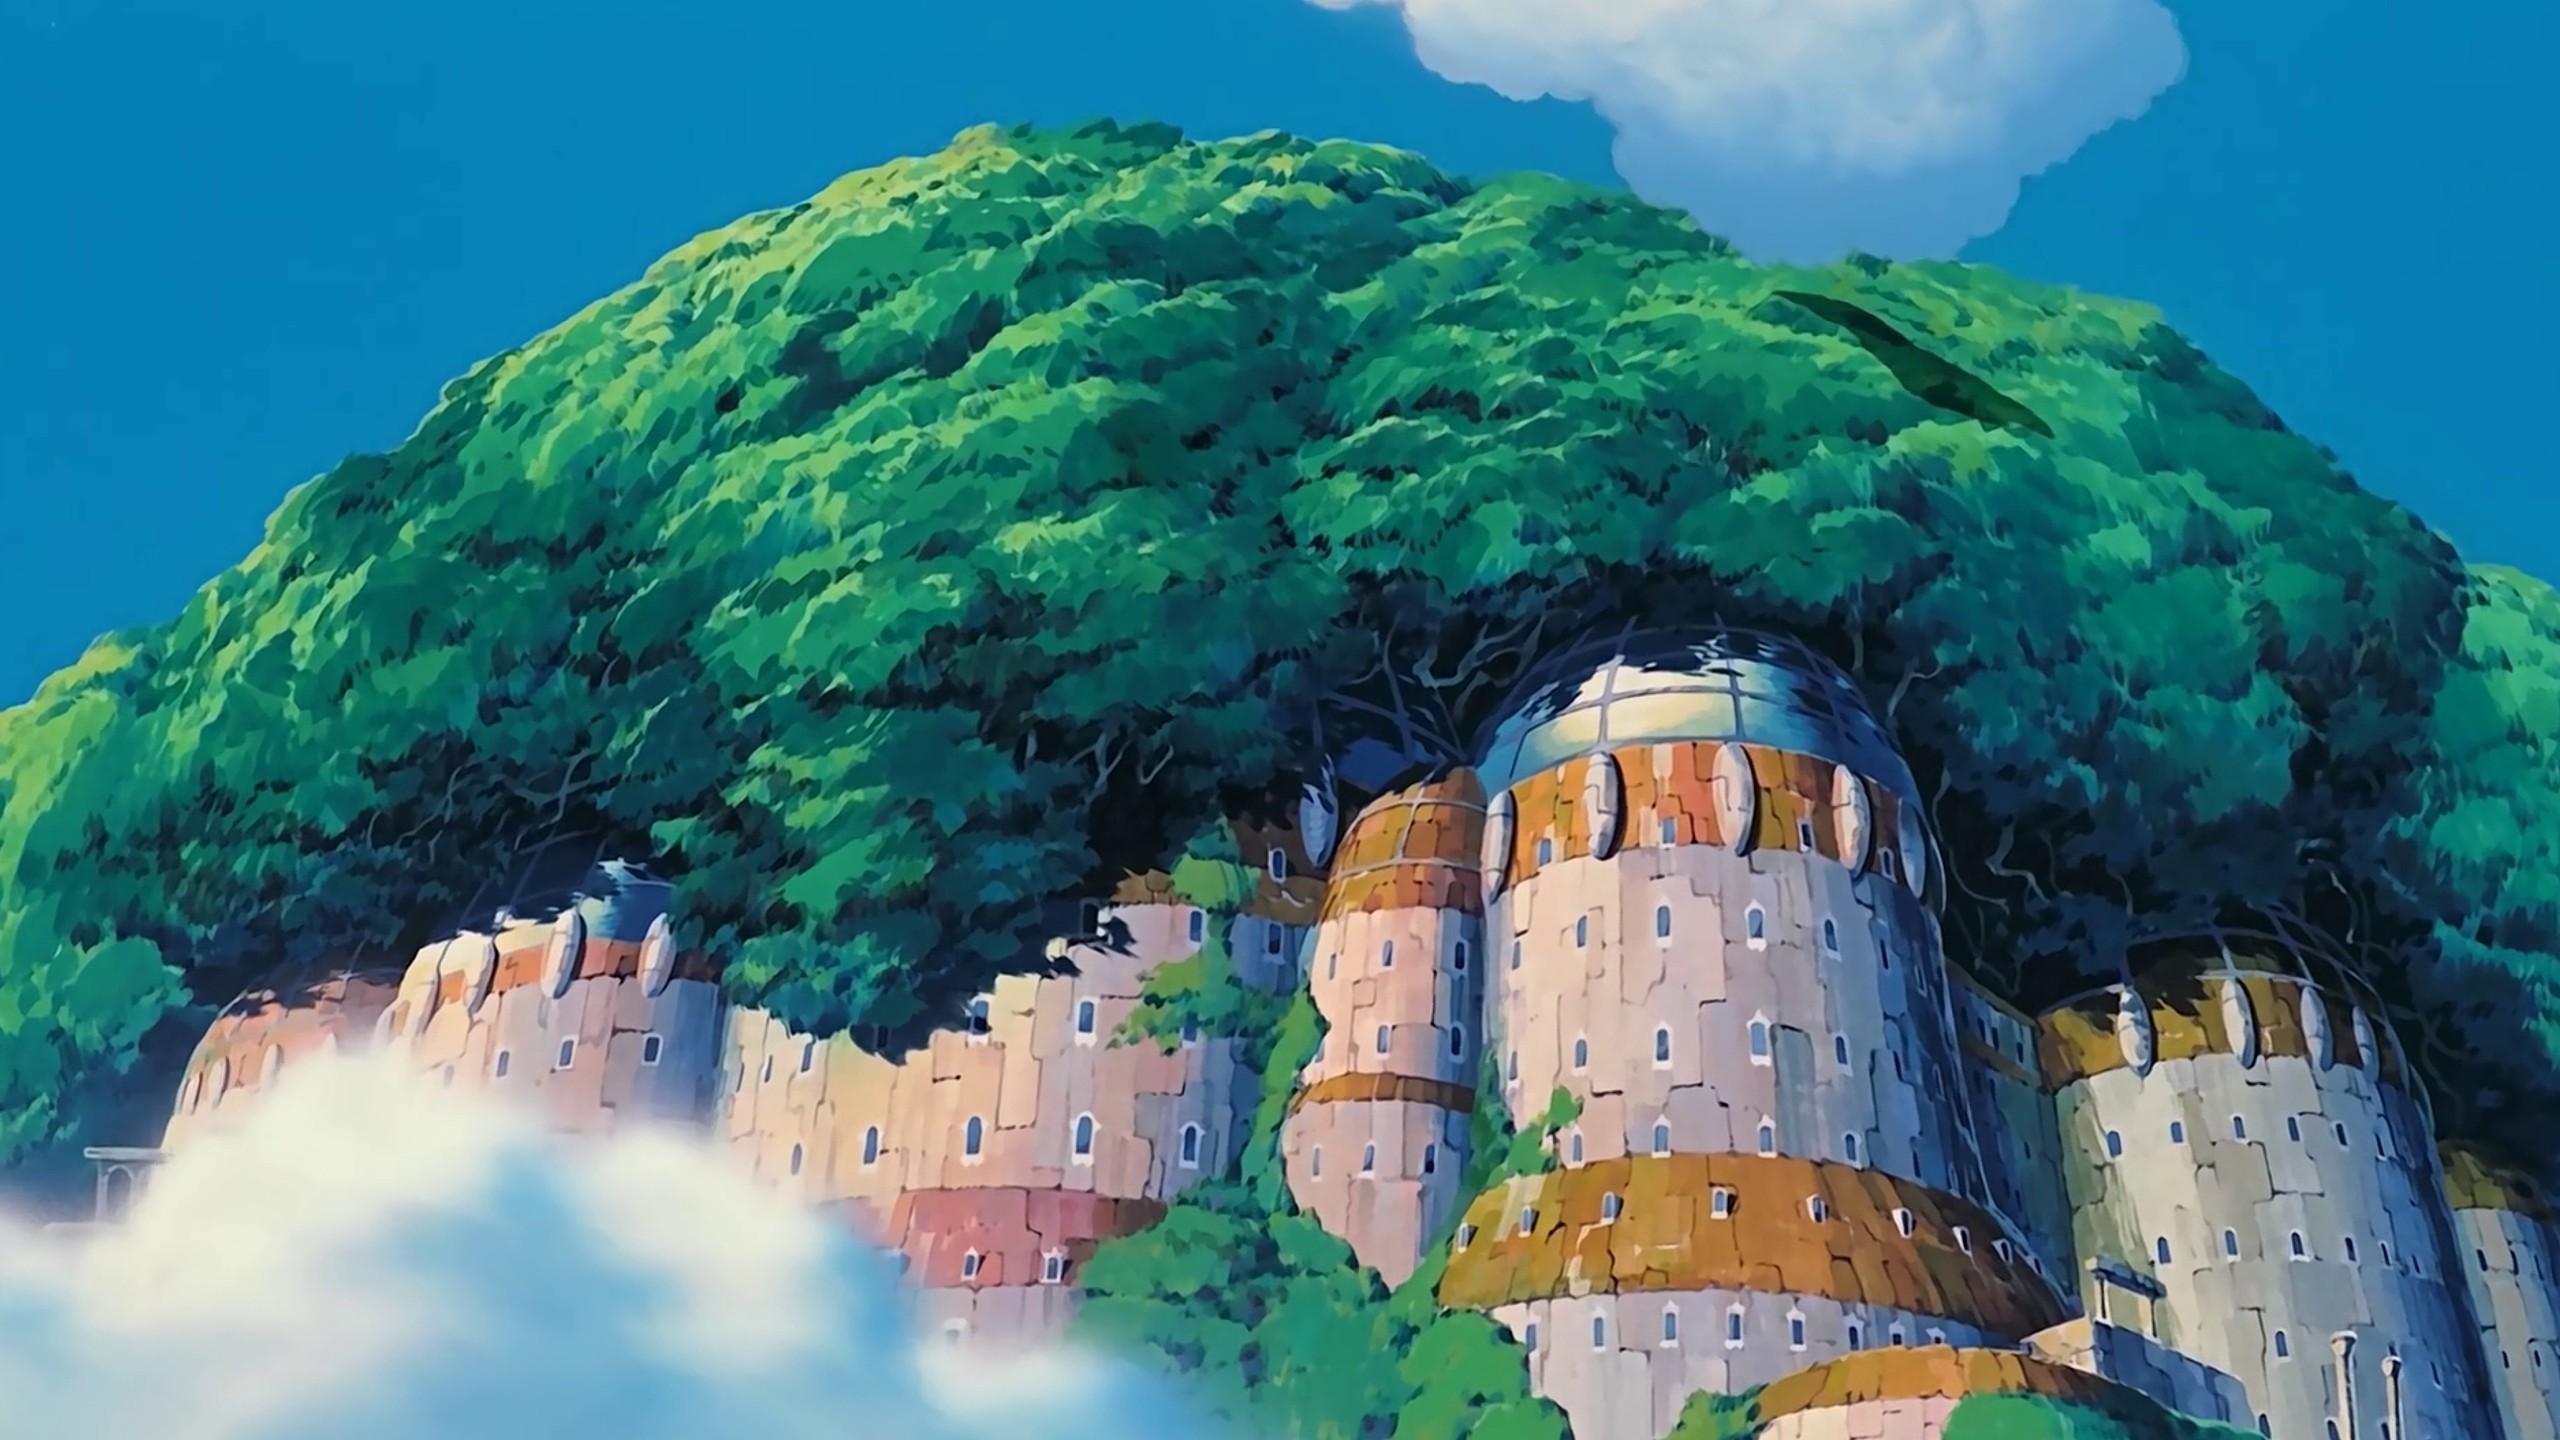 100 Seriously Awesome Ipad Pro Wallpapers: Miyazaki Wallpaper ·① Download Free Cool Full HD